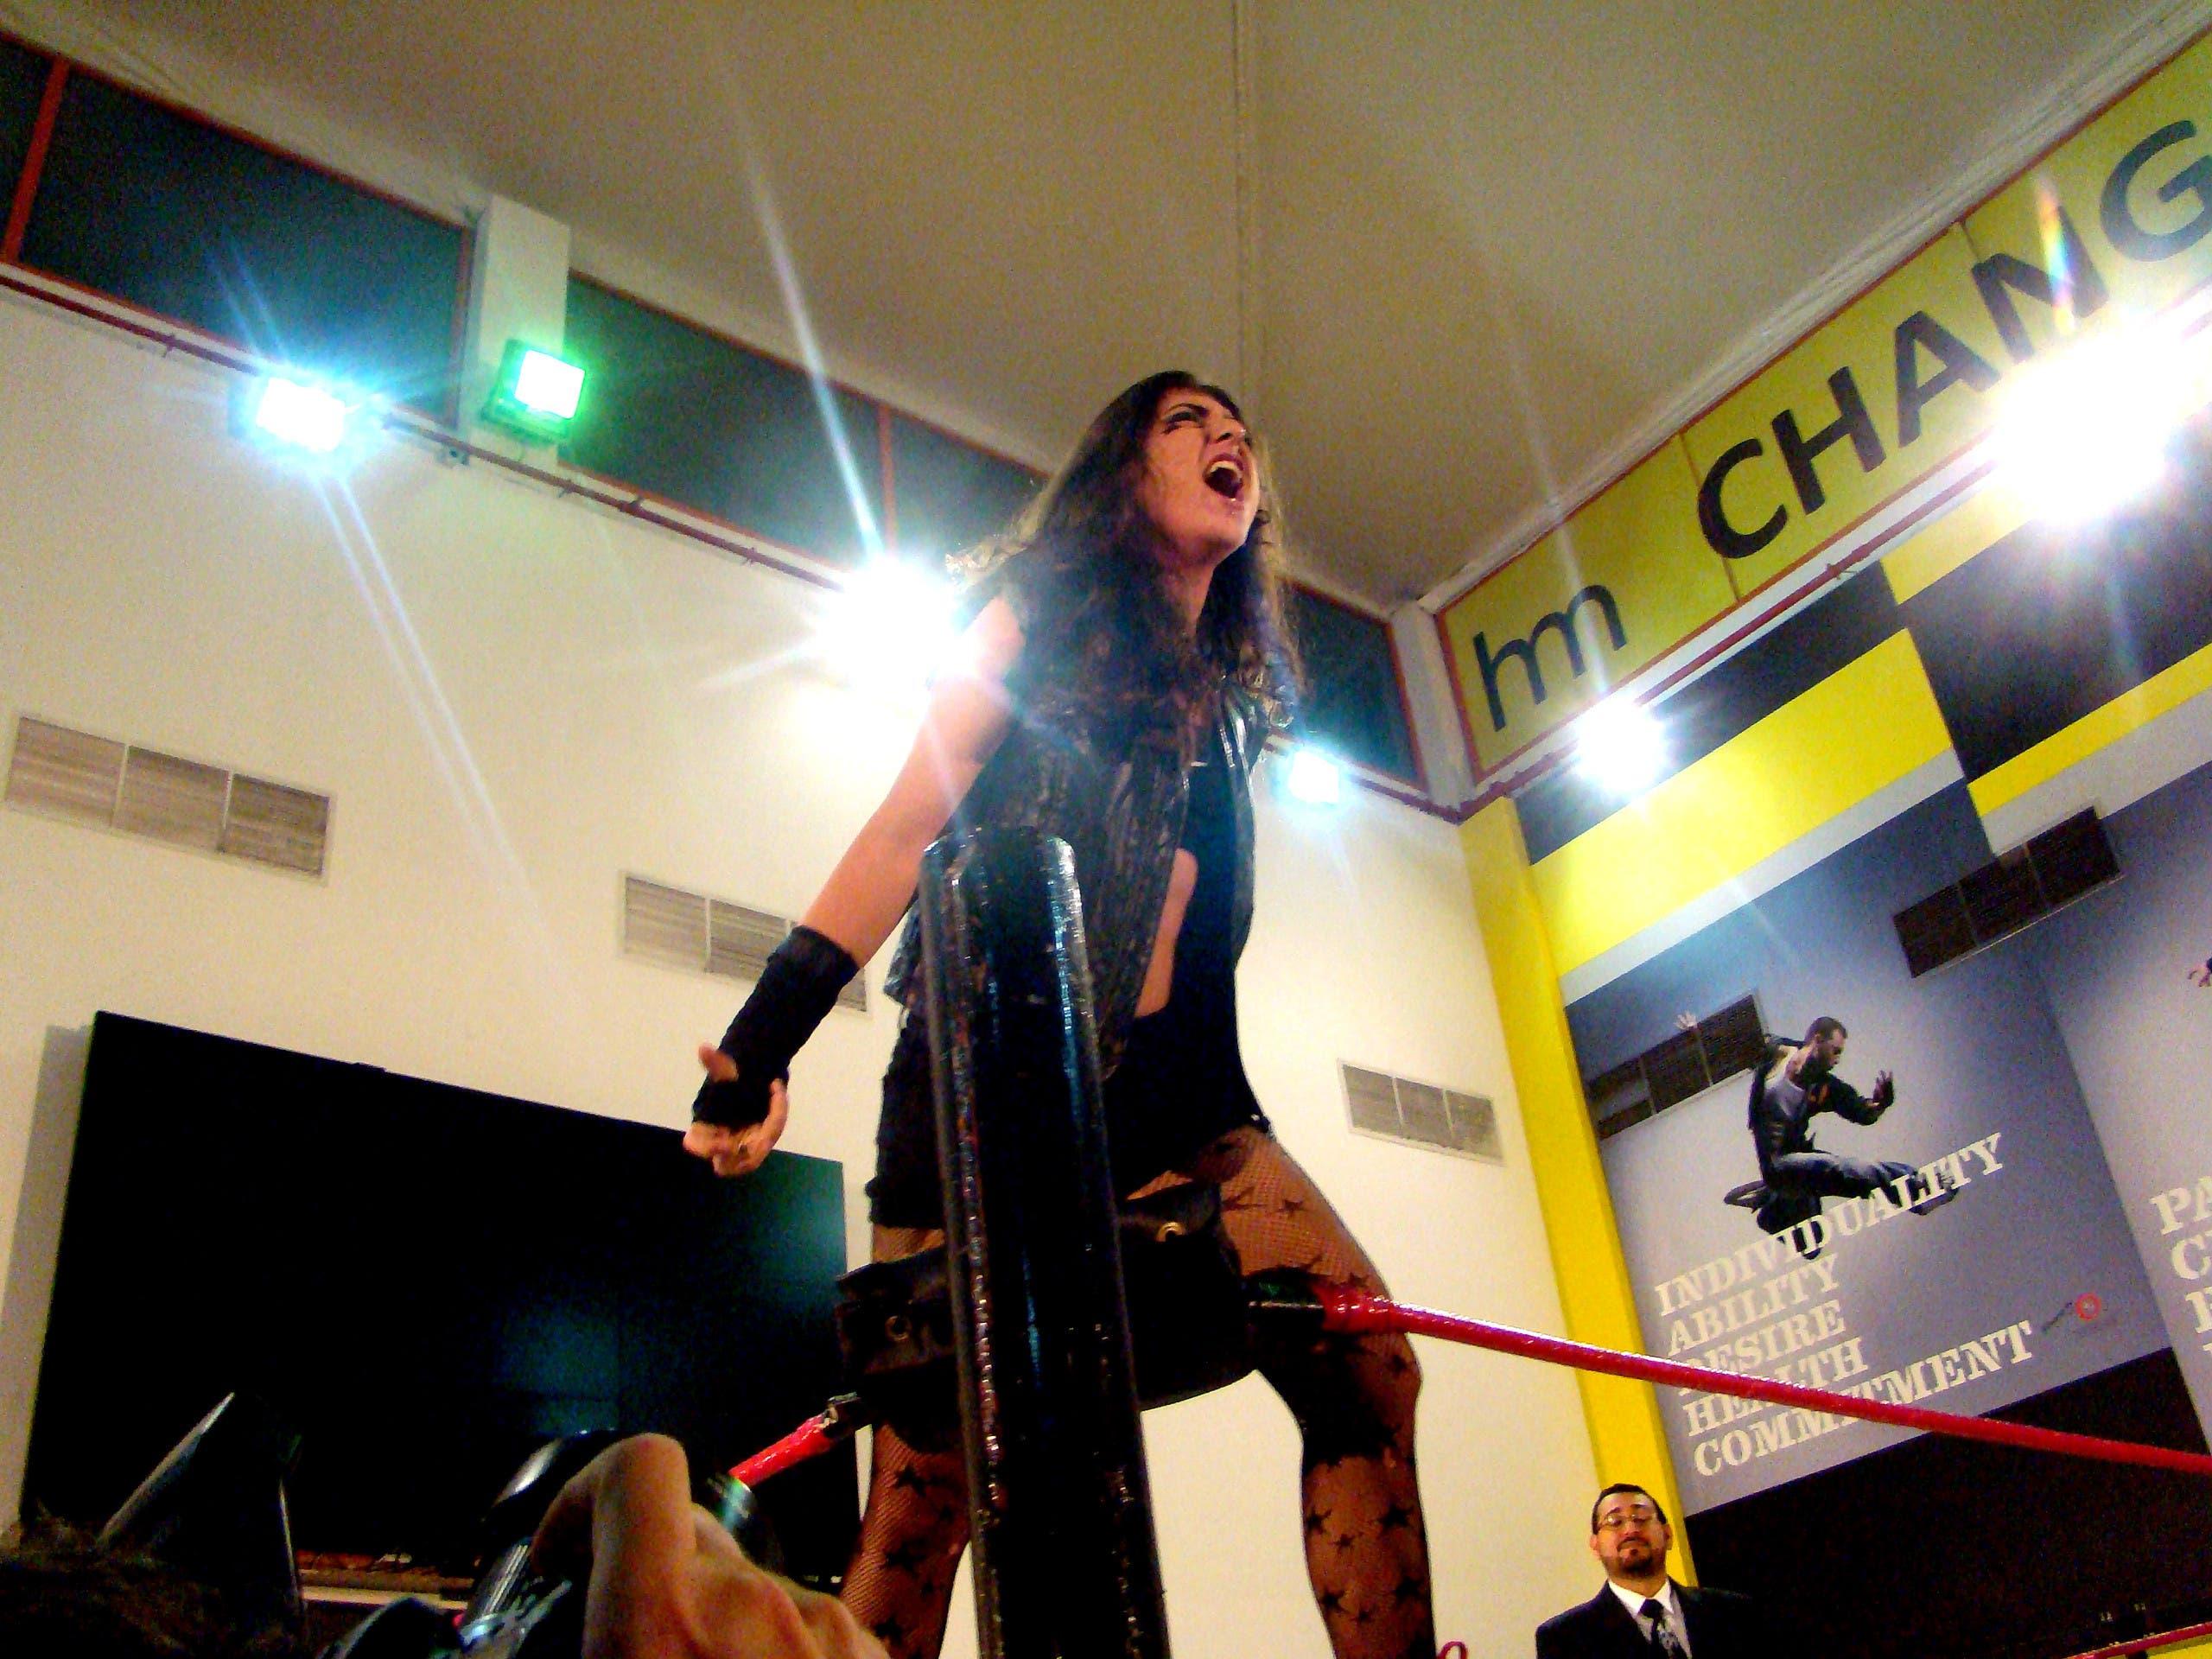 Joelle Hunter, first Arab female wrestler, at the Dubai Pro-Wrestling anniversary. (Tarek Ali Ahmad, Al Arabiya English)